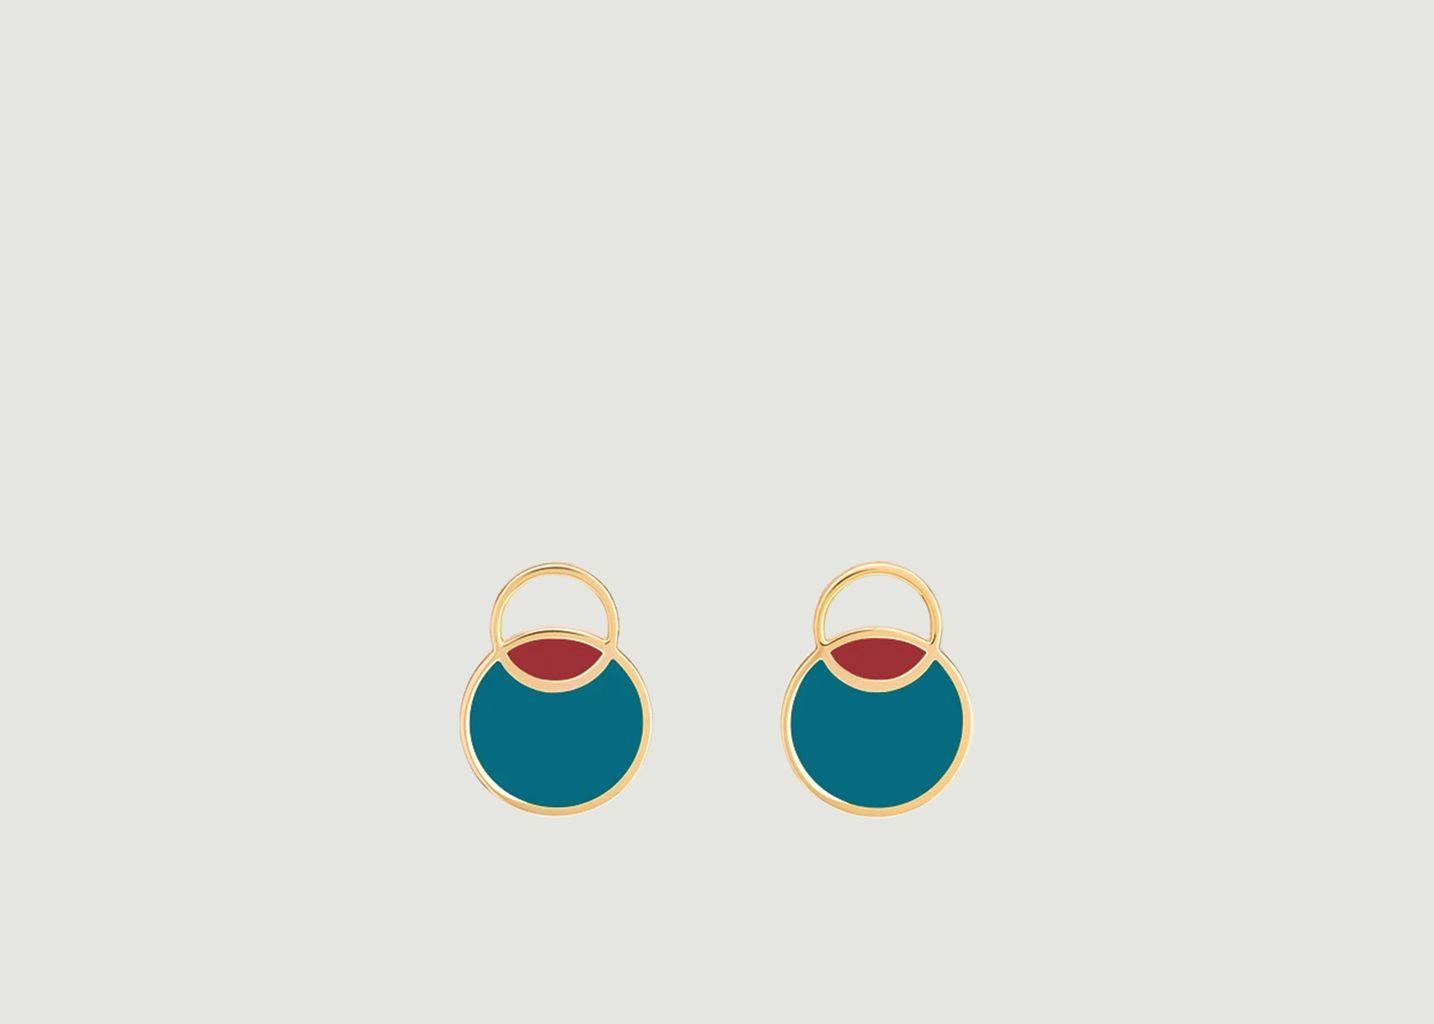 Boucles d'oreilles Sonia - Bangle Up